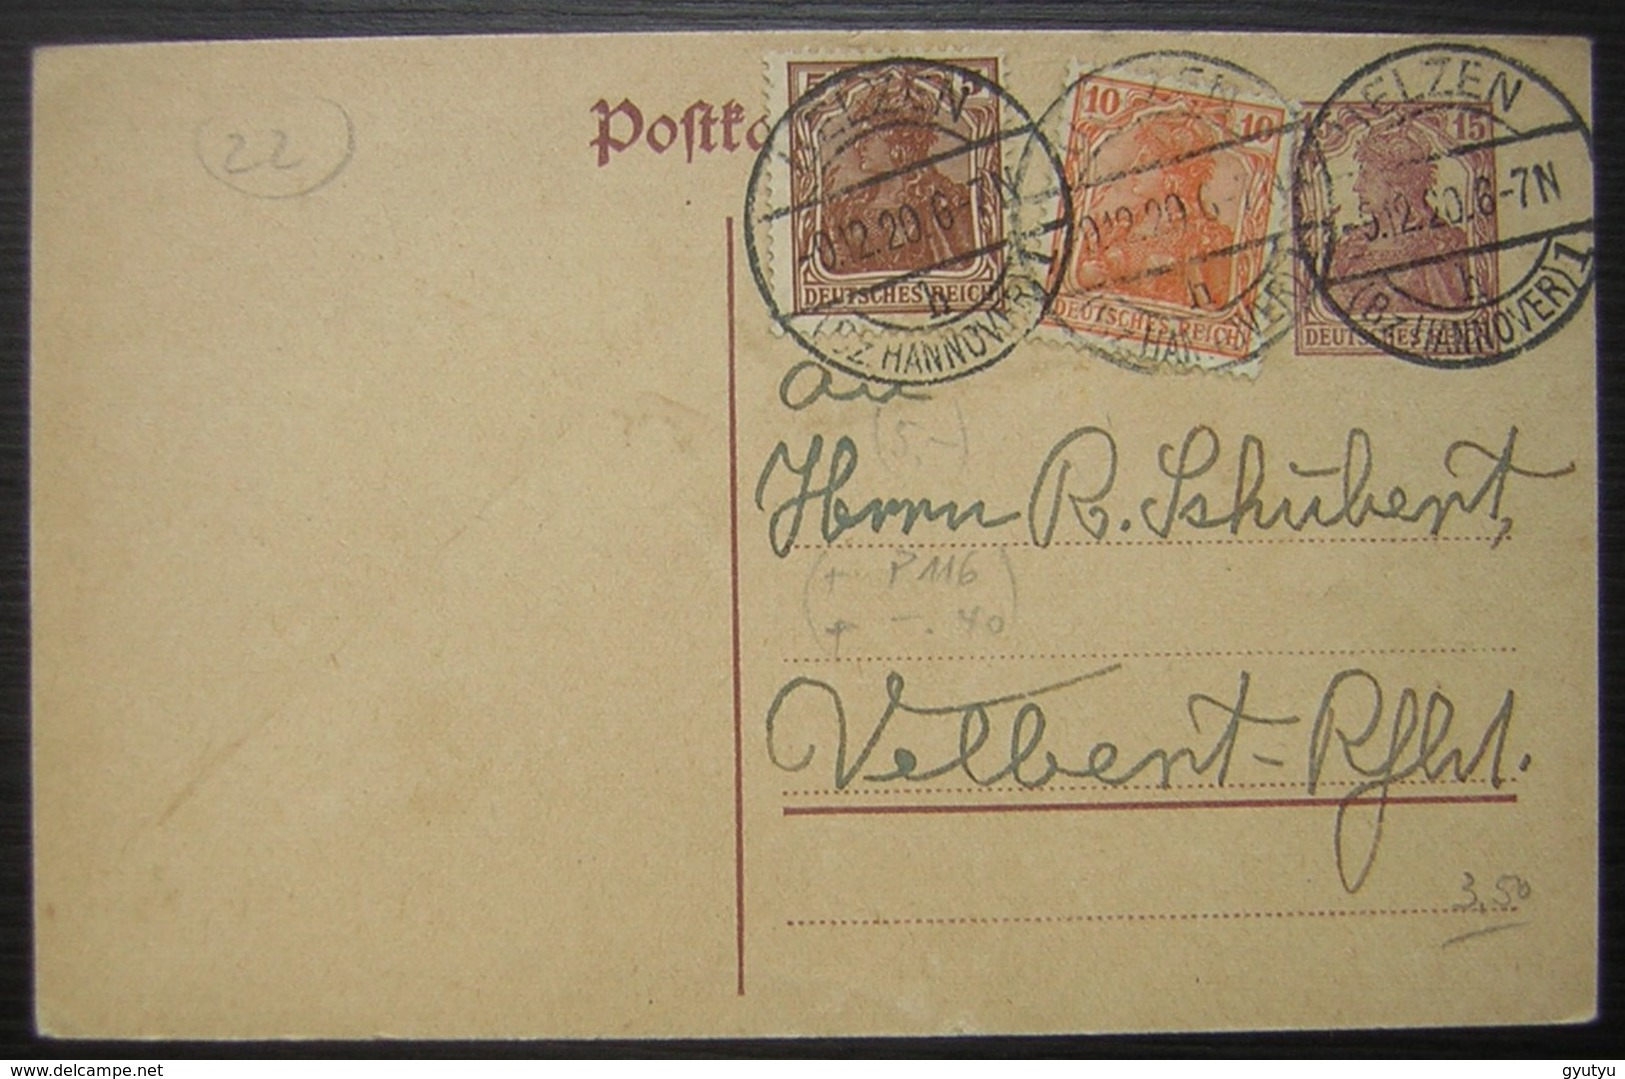 1920 Helzen Entier Postal Avec Complément D'affranchissement ( Deutsches Reich Allemagne) - Deutschland